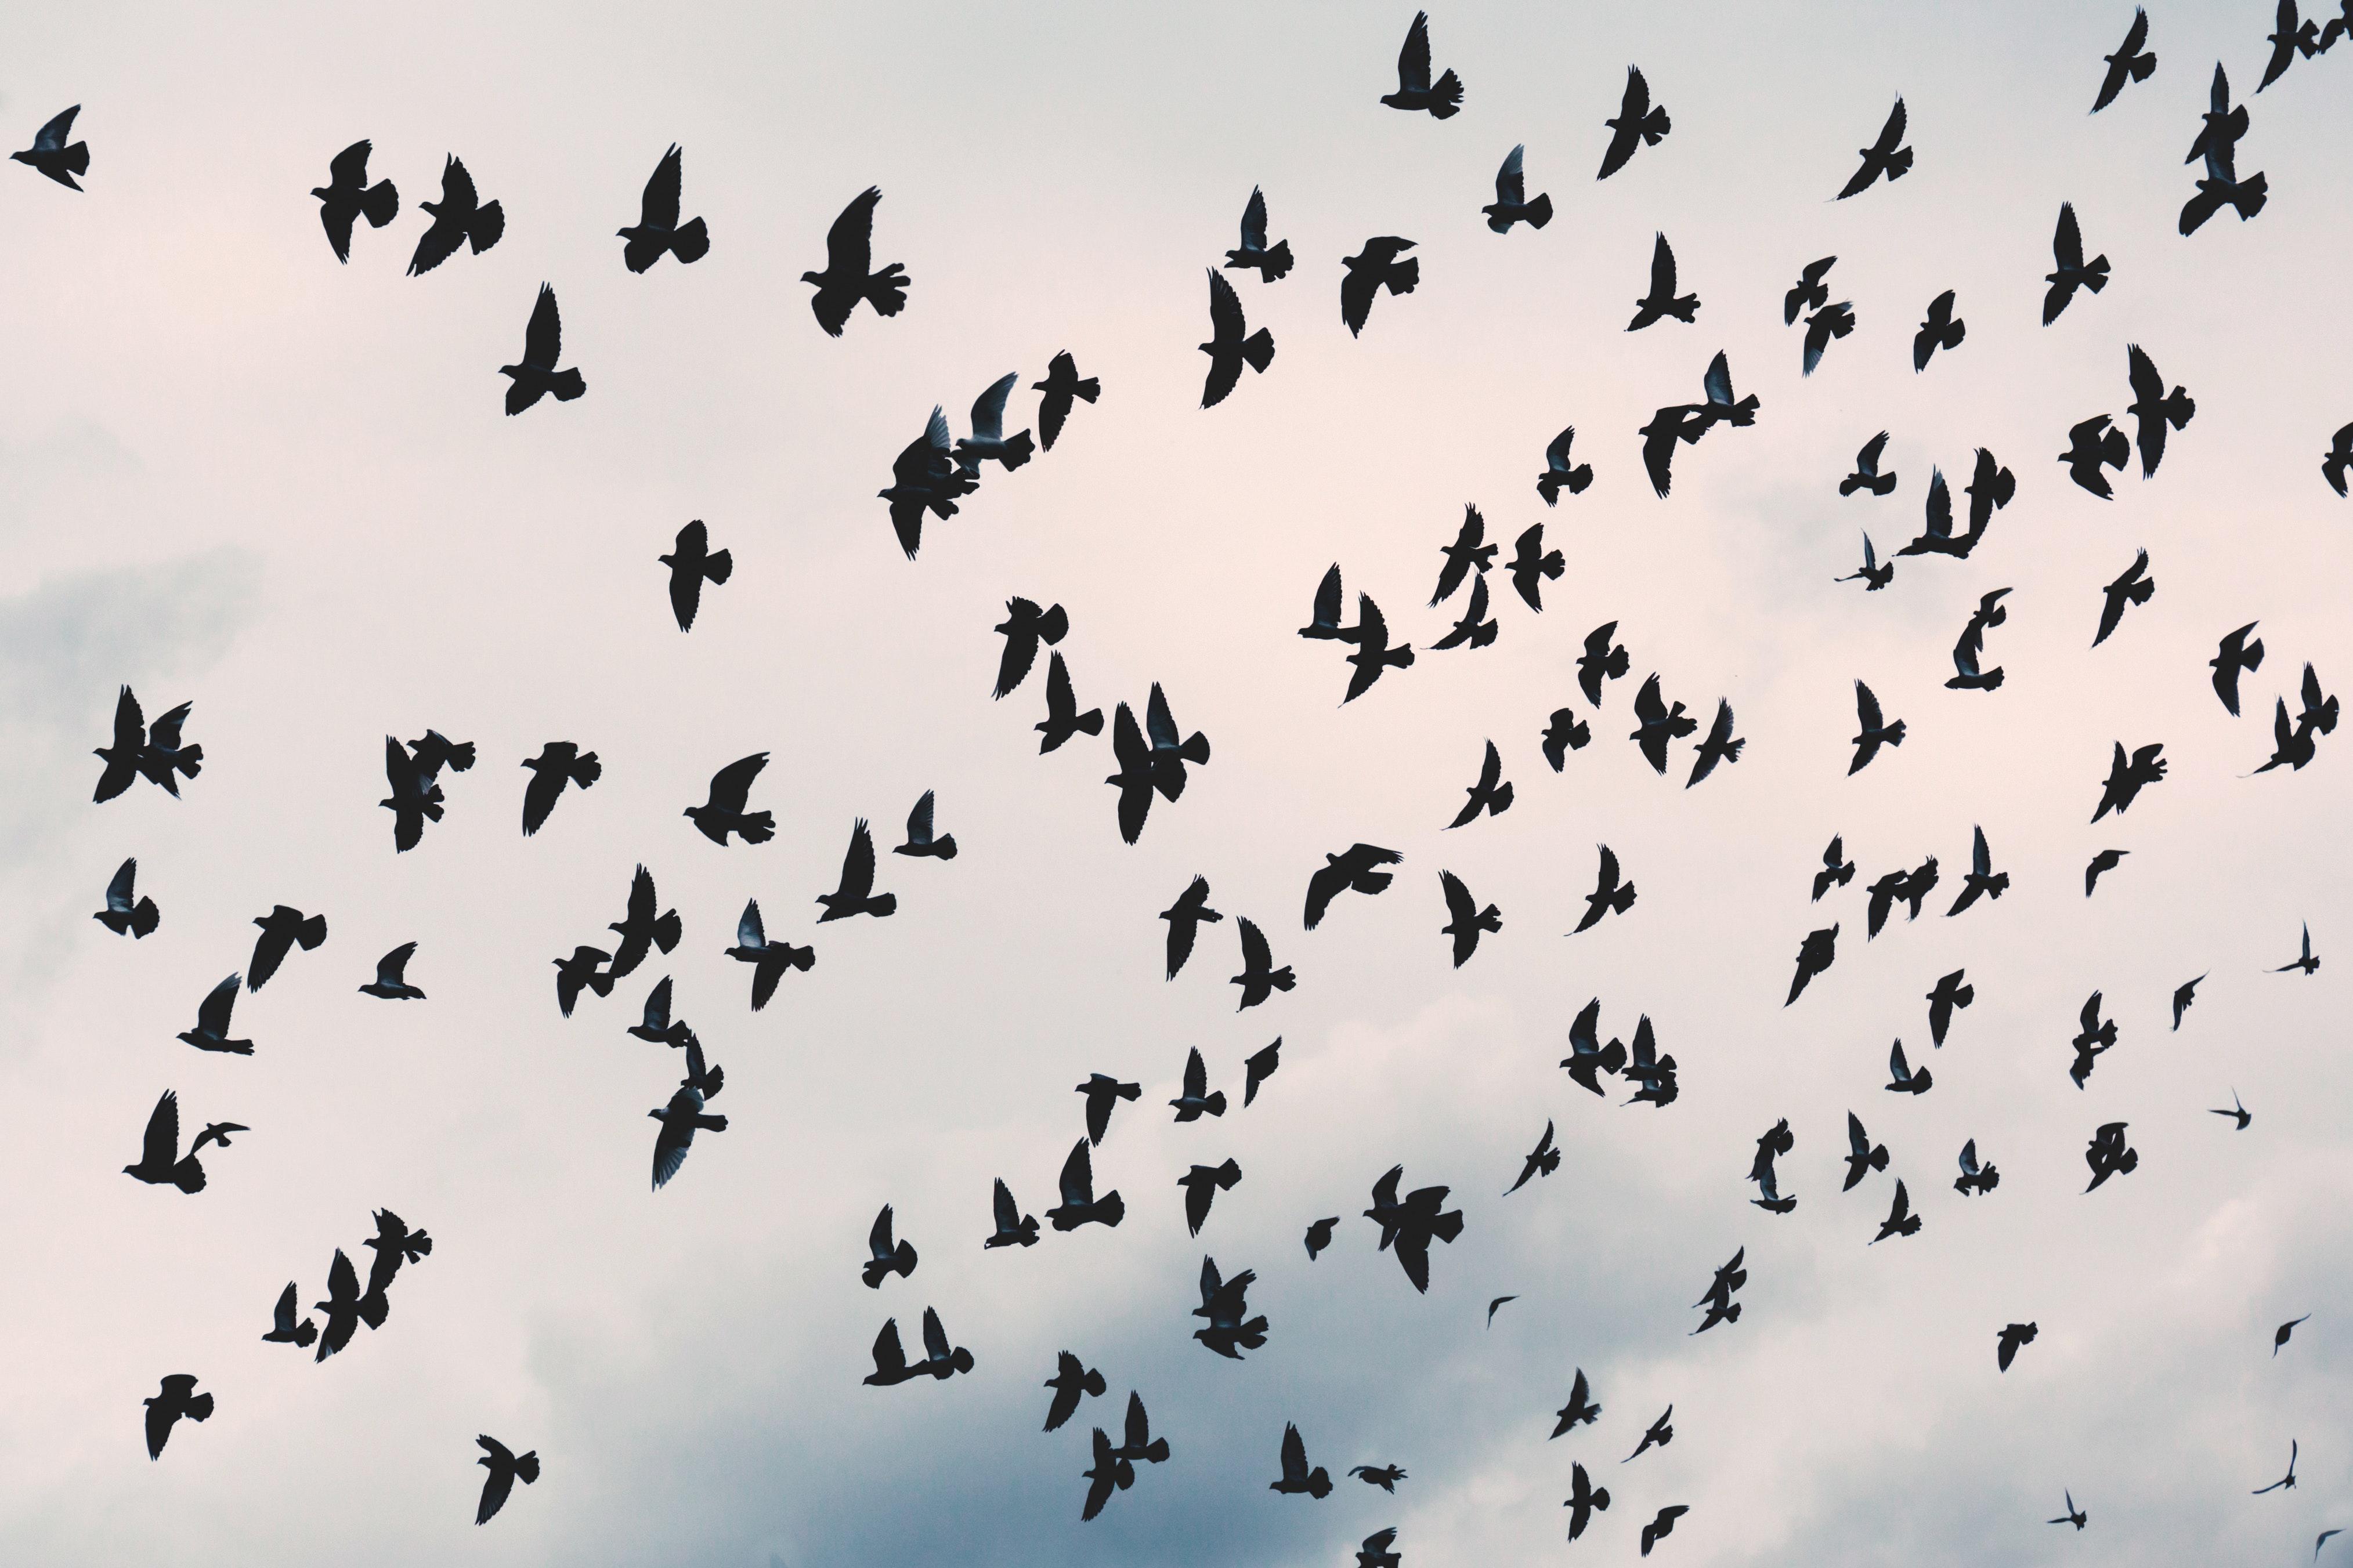 Wallpapers Hd Flying Birds Apple Animals Blue Sky Desktop: 507 Colorful Bird Pictures · Pexels · Free Stock Photos